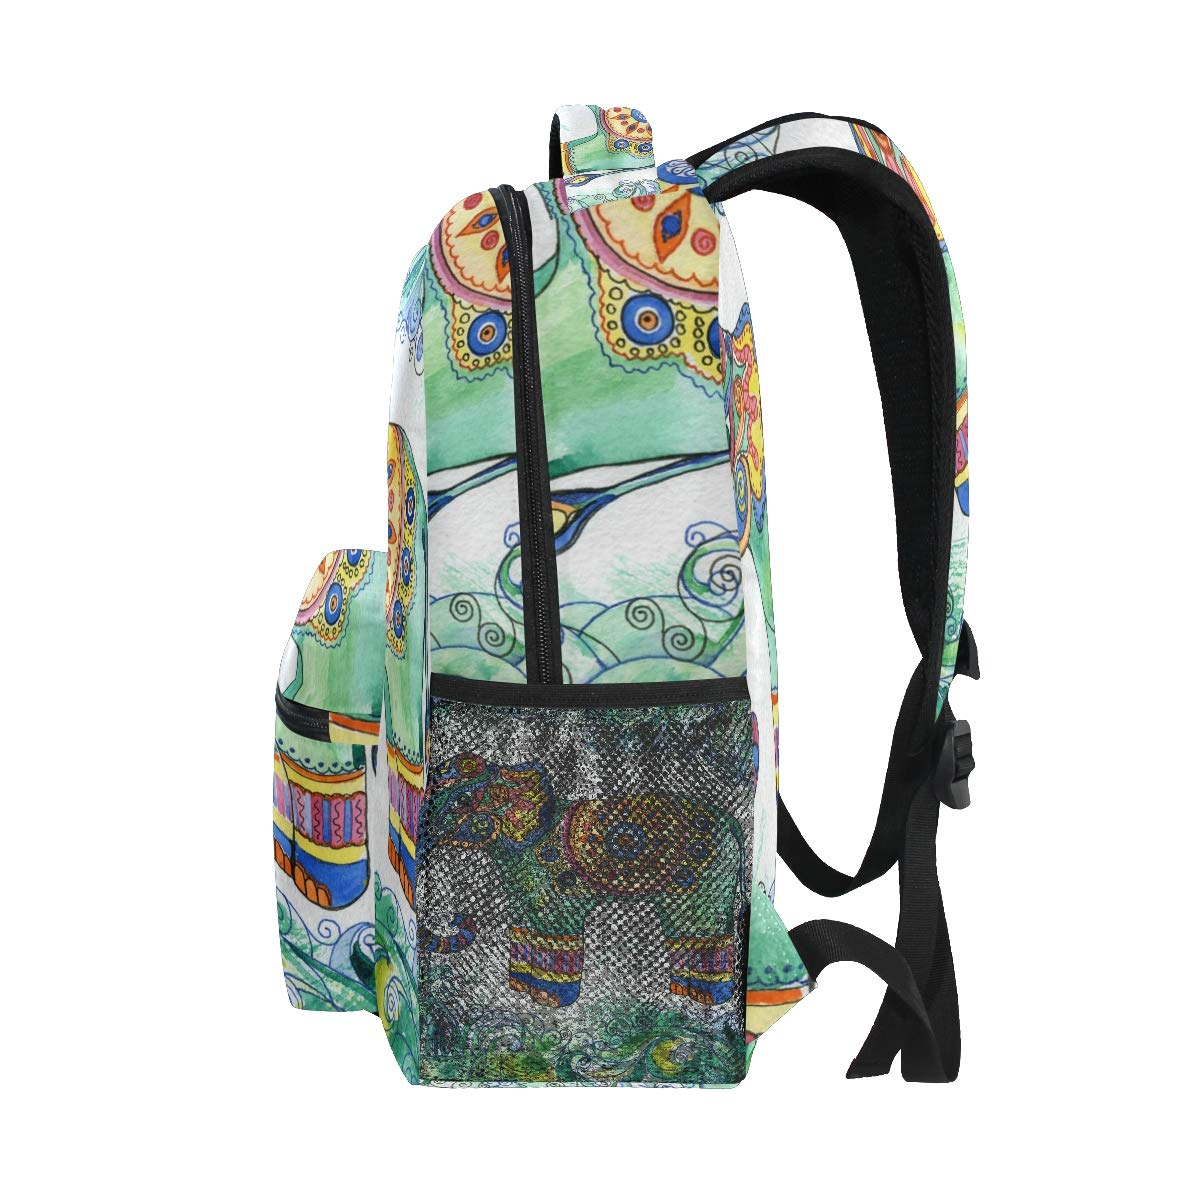 DOSHINE g15043842p203c237s337, Unisex-Erwachsene Kinderrucksack Mehrfarbig Mehrfarbig 11.5''x8''x16'' B07M5ZL6T2 Kinderruckscke Hochwertige Hochwertige Hochwertige Produkte 6358cc